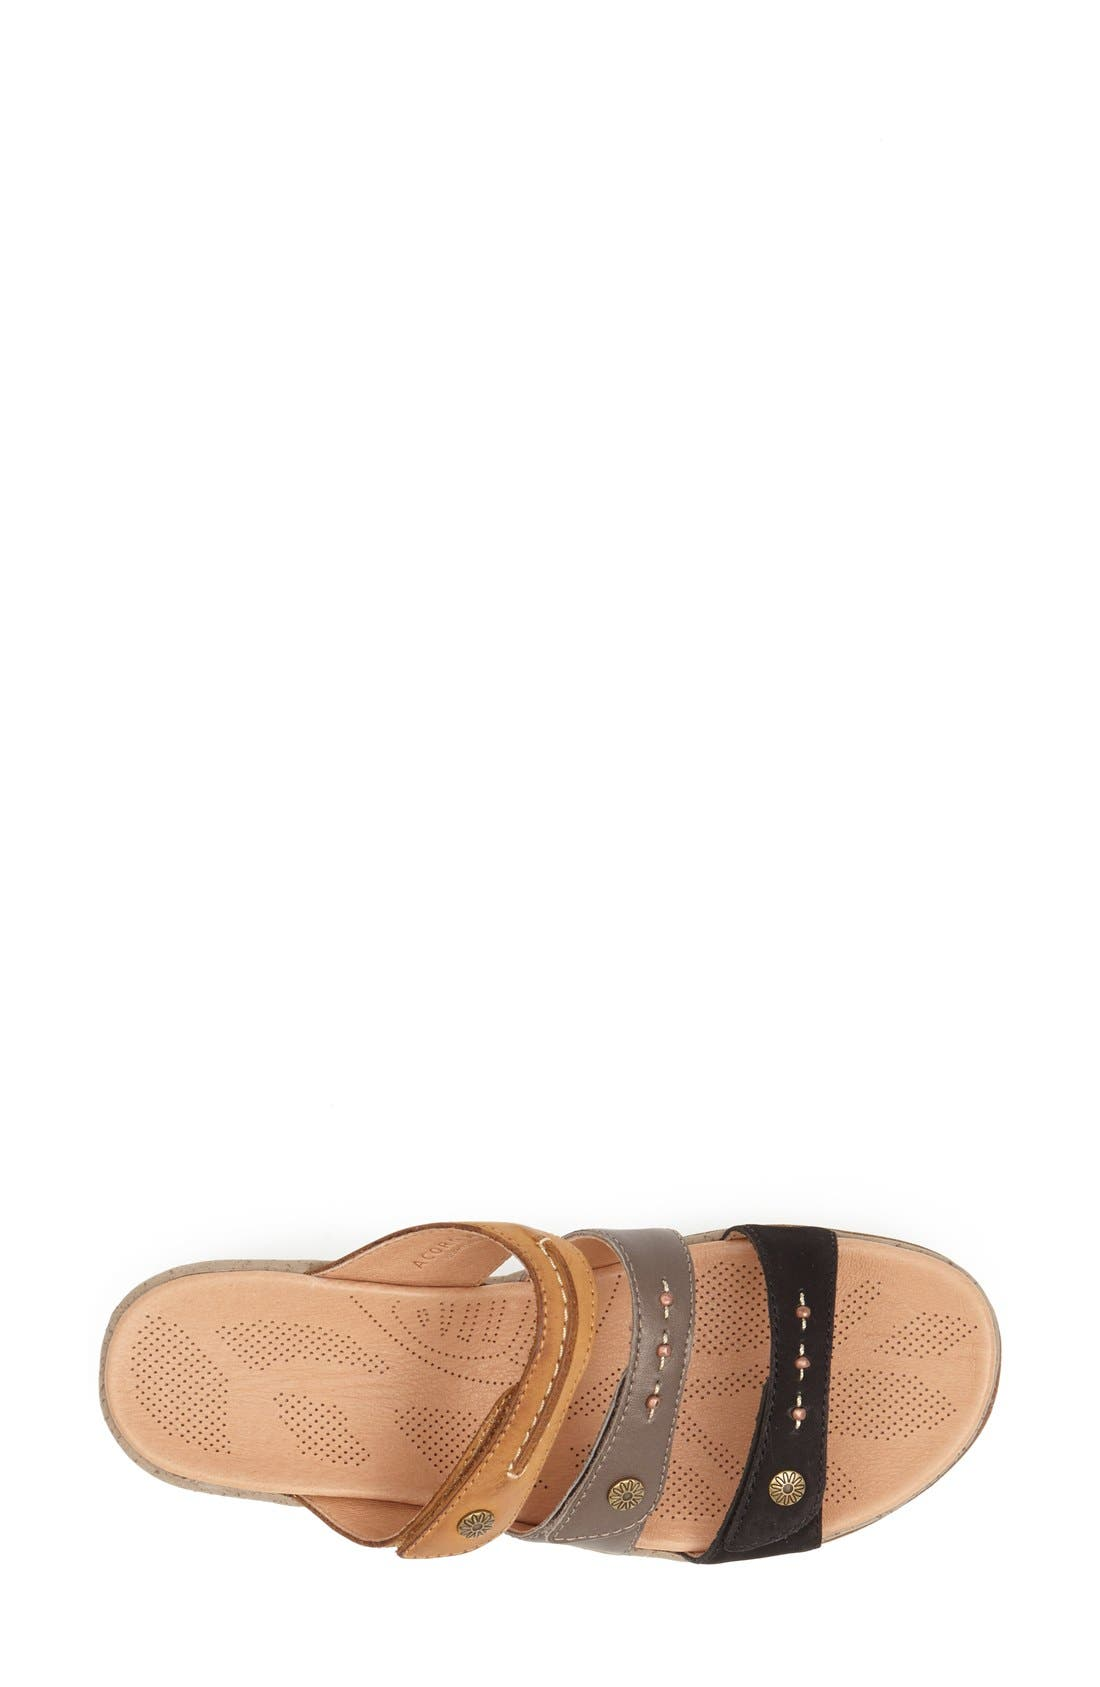 Alternate Image 3  - Acorn 'Vista' Wedge Sandal (Women)